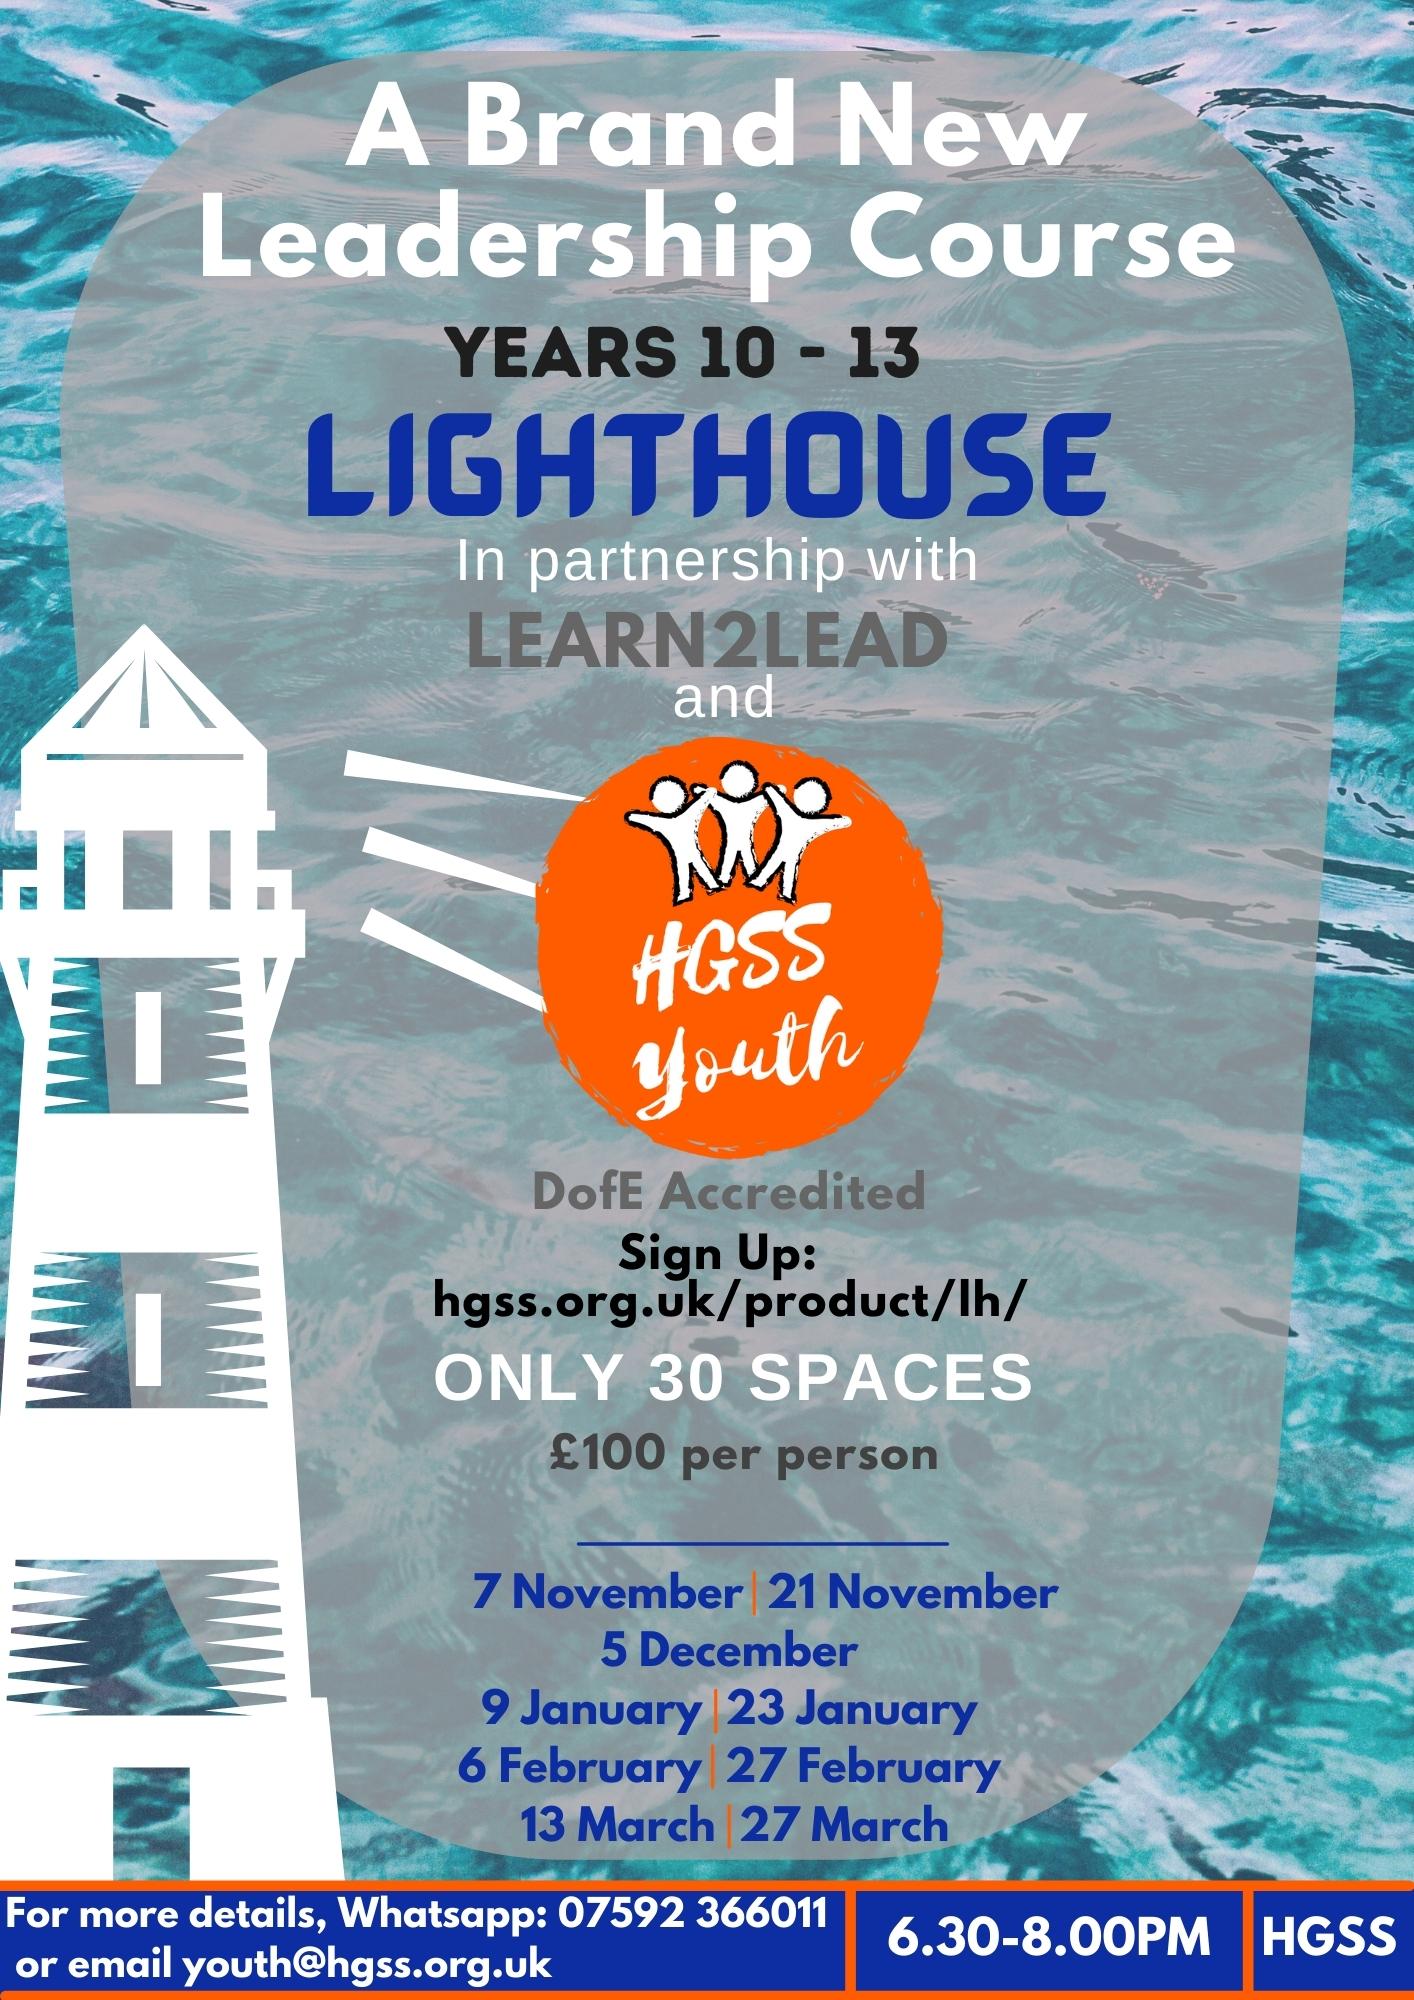 LightHouse Leadership Programme @ HGSS